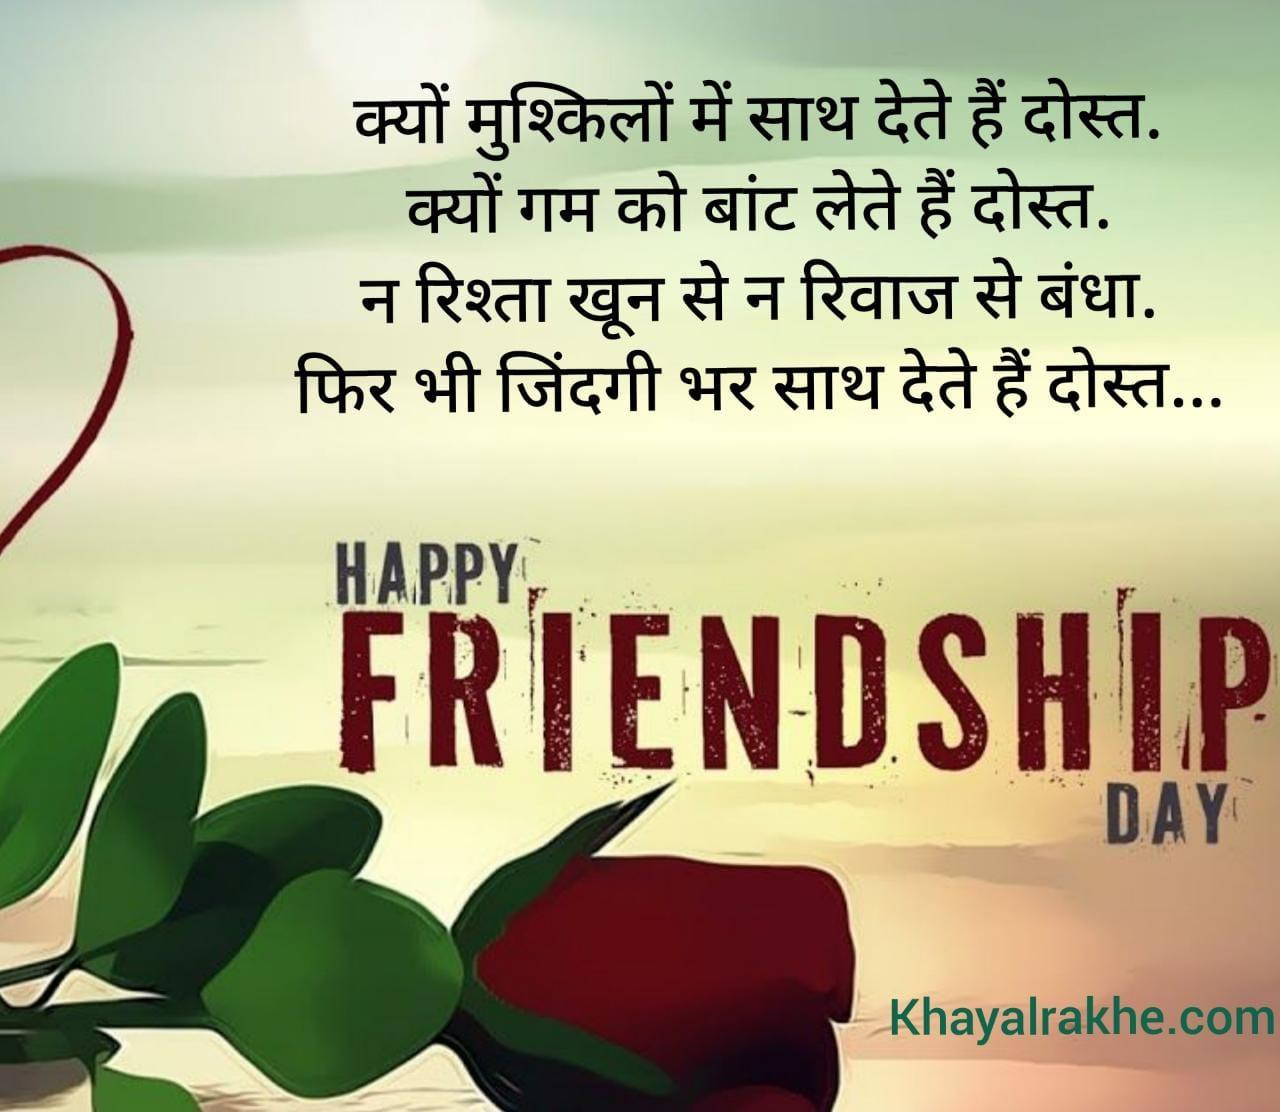 Friendship Day 2020 in Hindi - Status